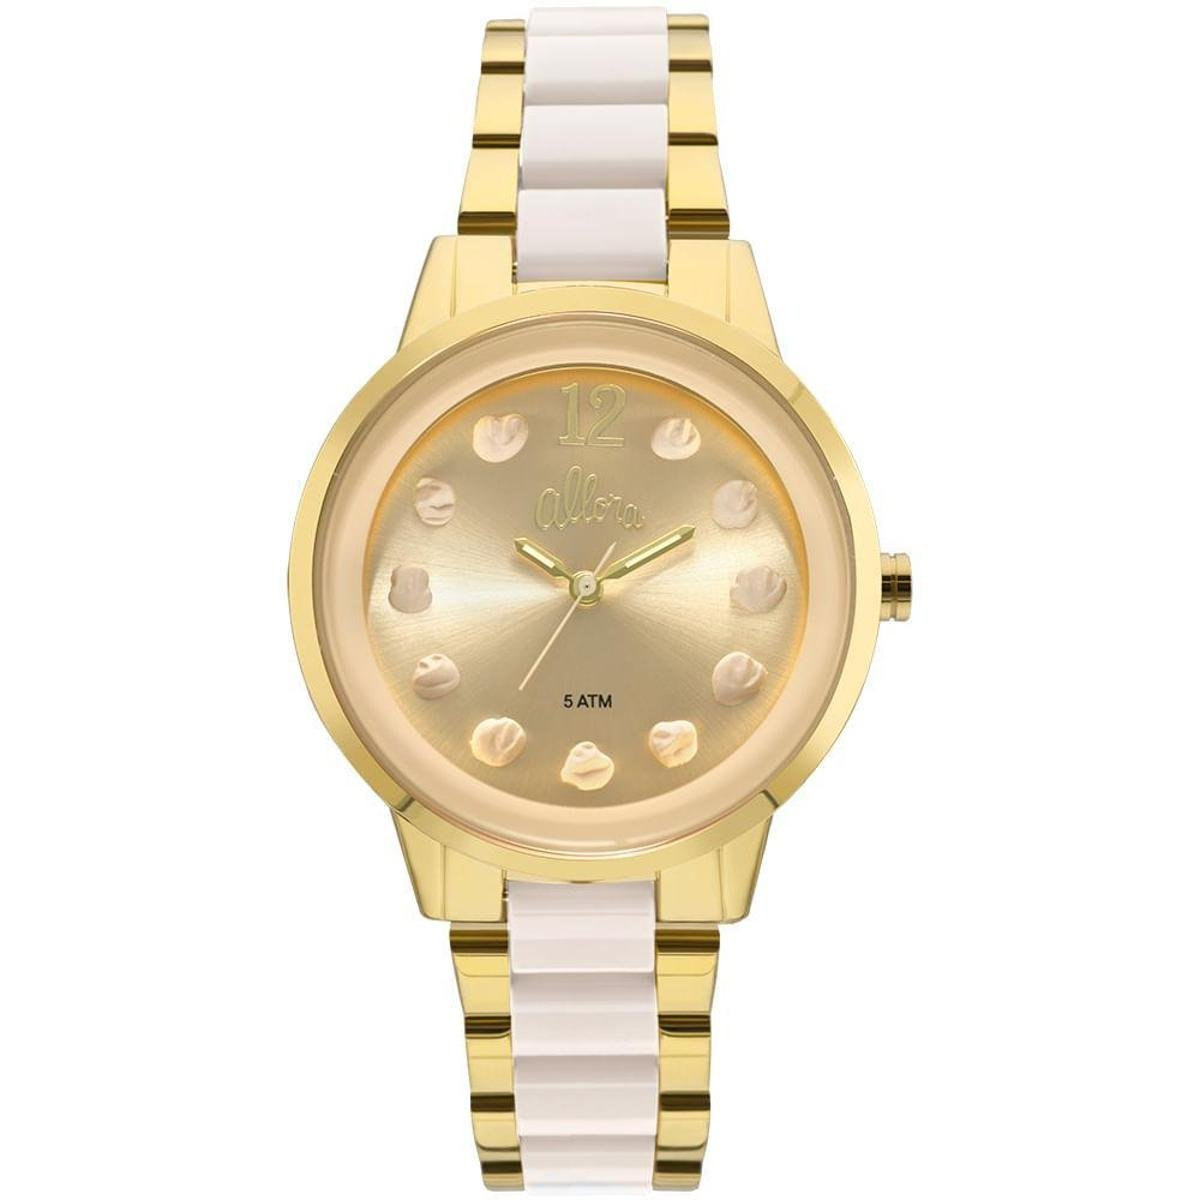 Relógio Allora Feminino Par Perfeito Flor Bicolor - AL2039AS K4B  AL2039AS K4B 21c4f5adb8